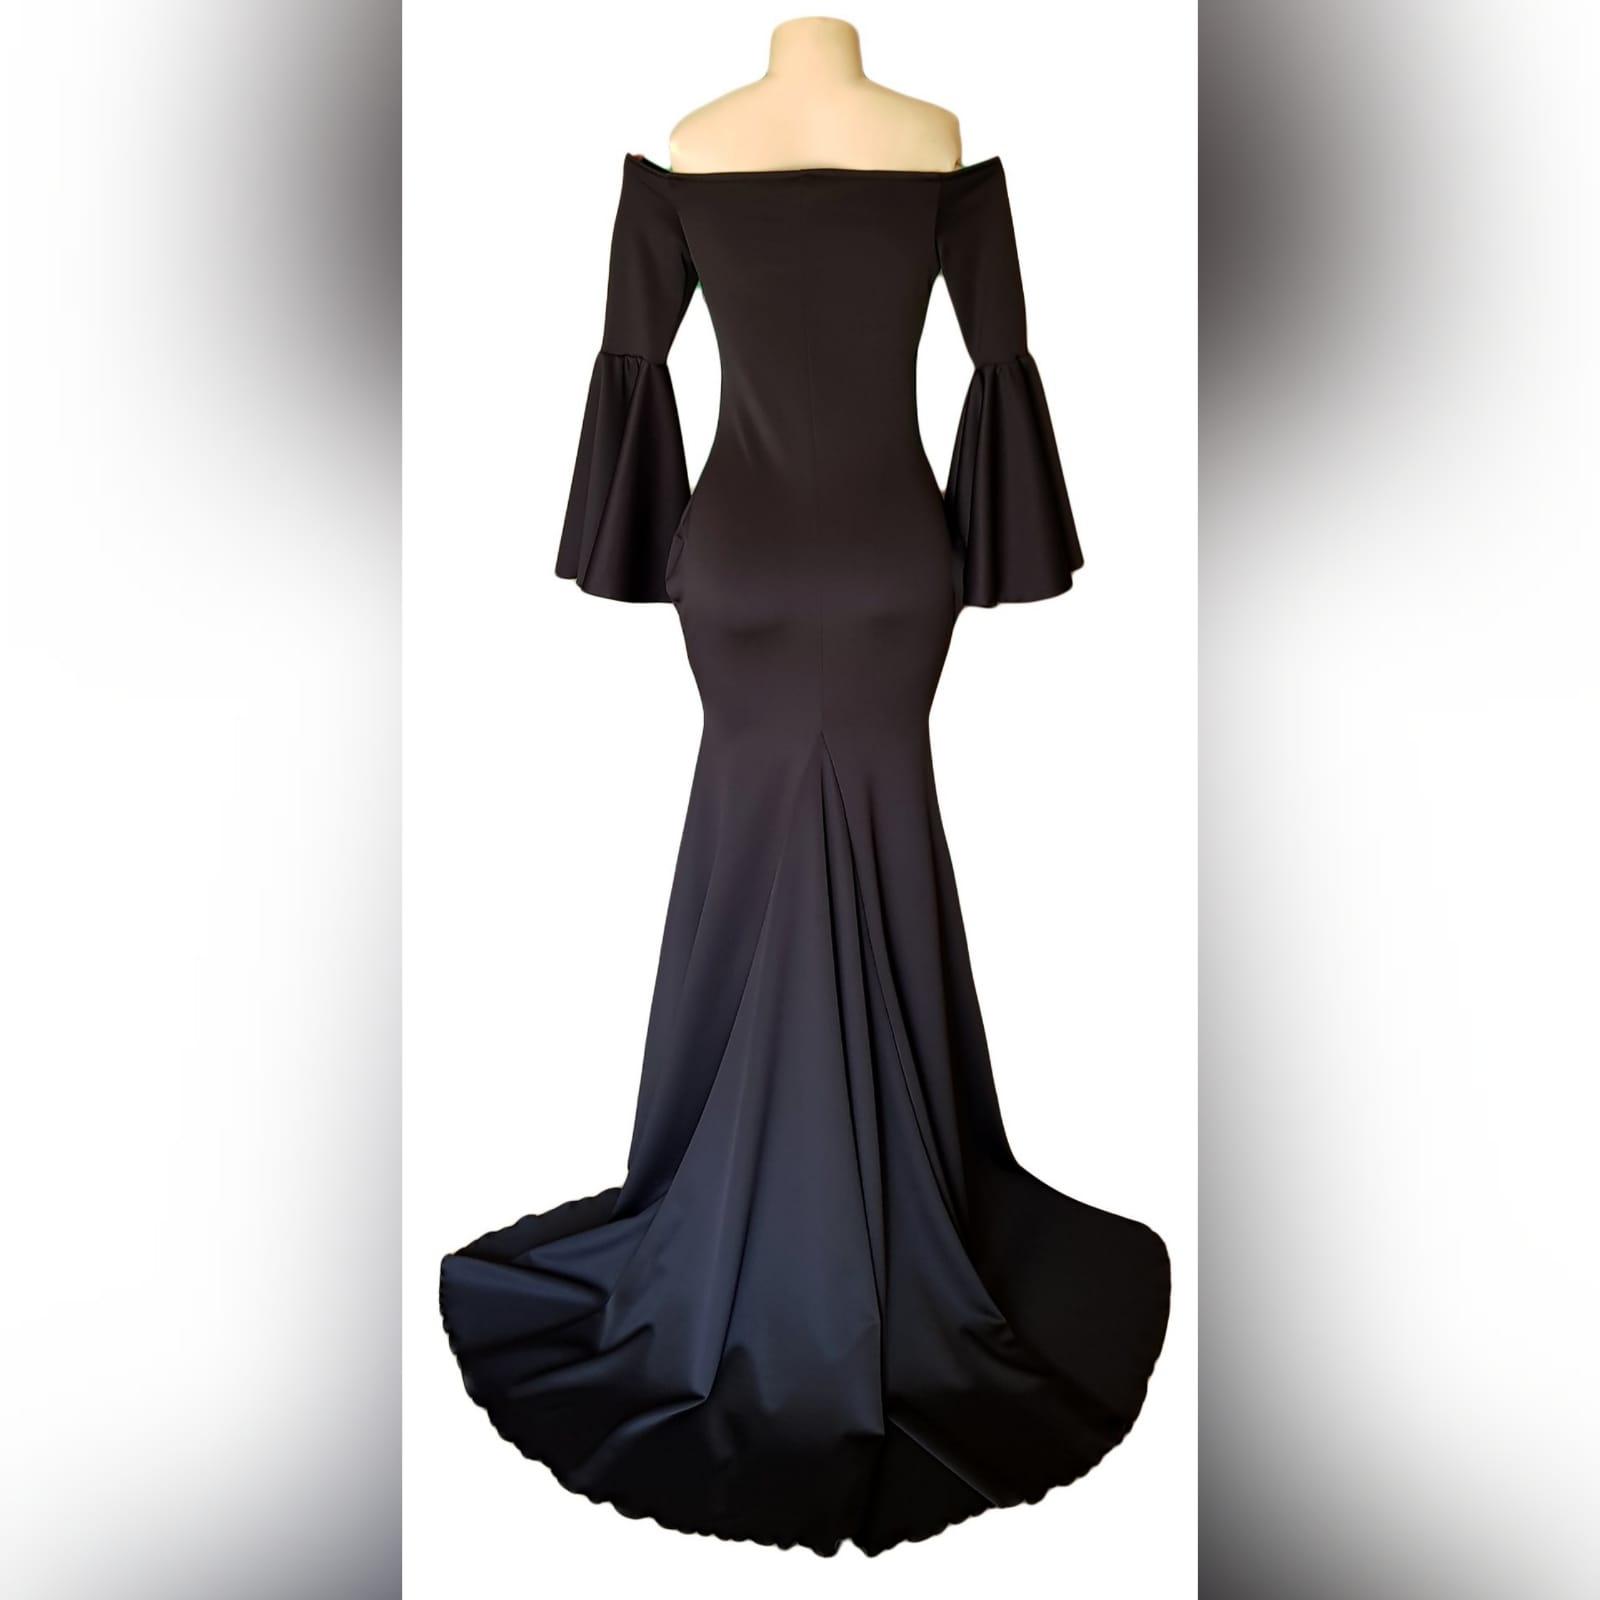 Black off shoulder boob tube prom dress 4 black off shoulder boob tube prom dress with bell long sleeves in a soft mermaid, with train.